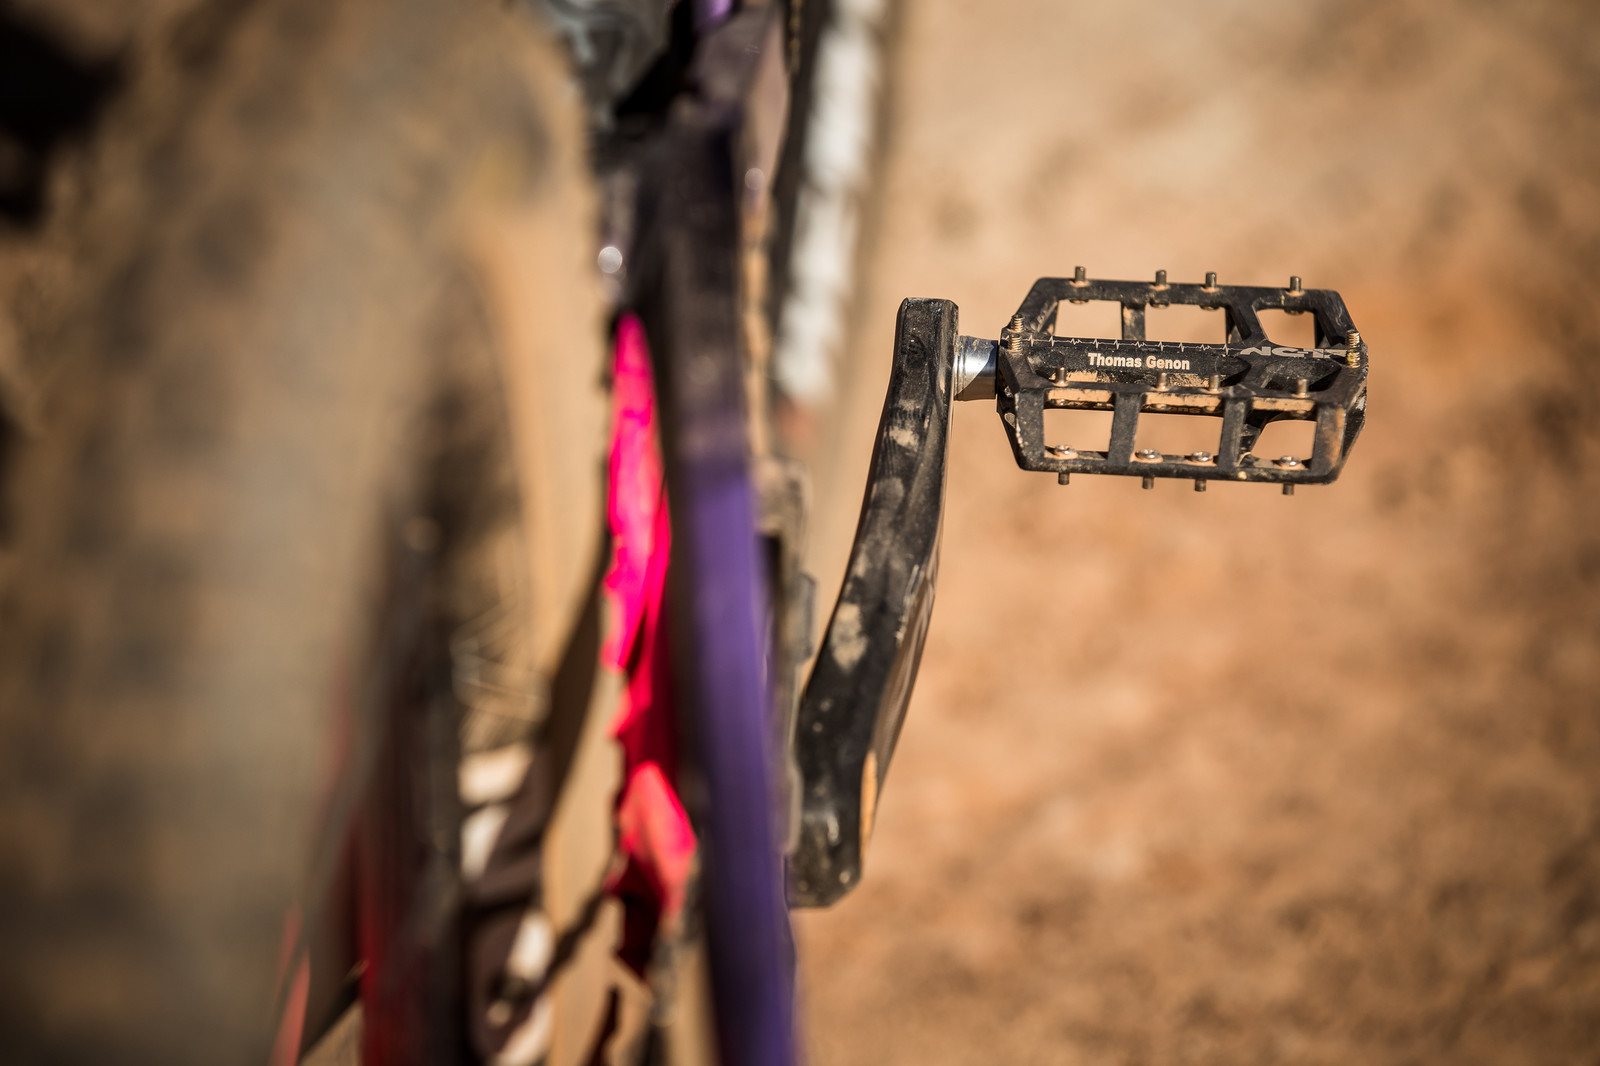 Shin Eaters on Thomas Genon's Rampage 2019 Canyon Sender - RAMPAGE BIKE - Thomas Genon's Canyon Sender - Mountain Biking Pictures - Vital MTB